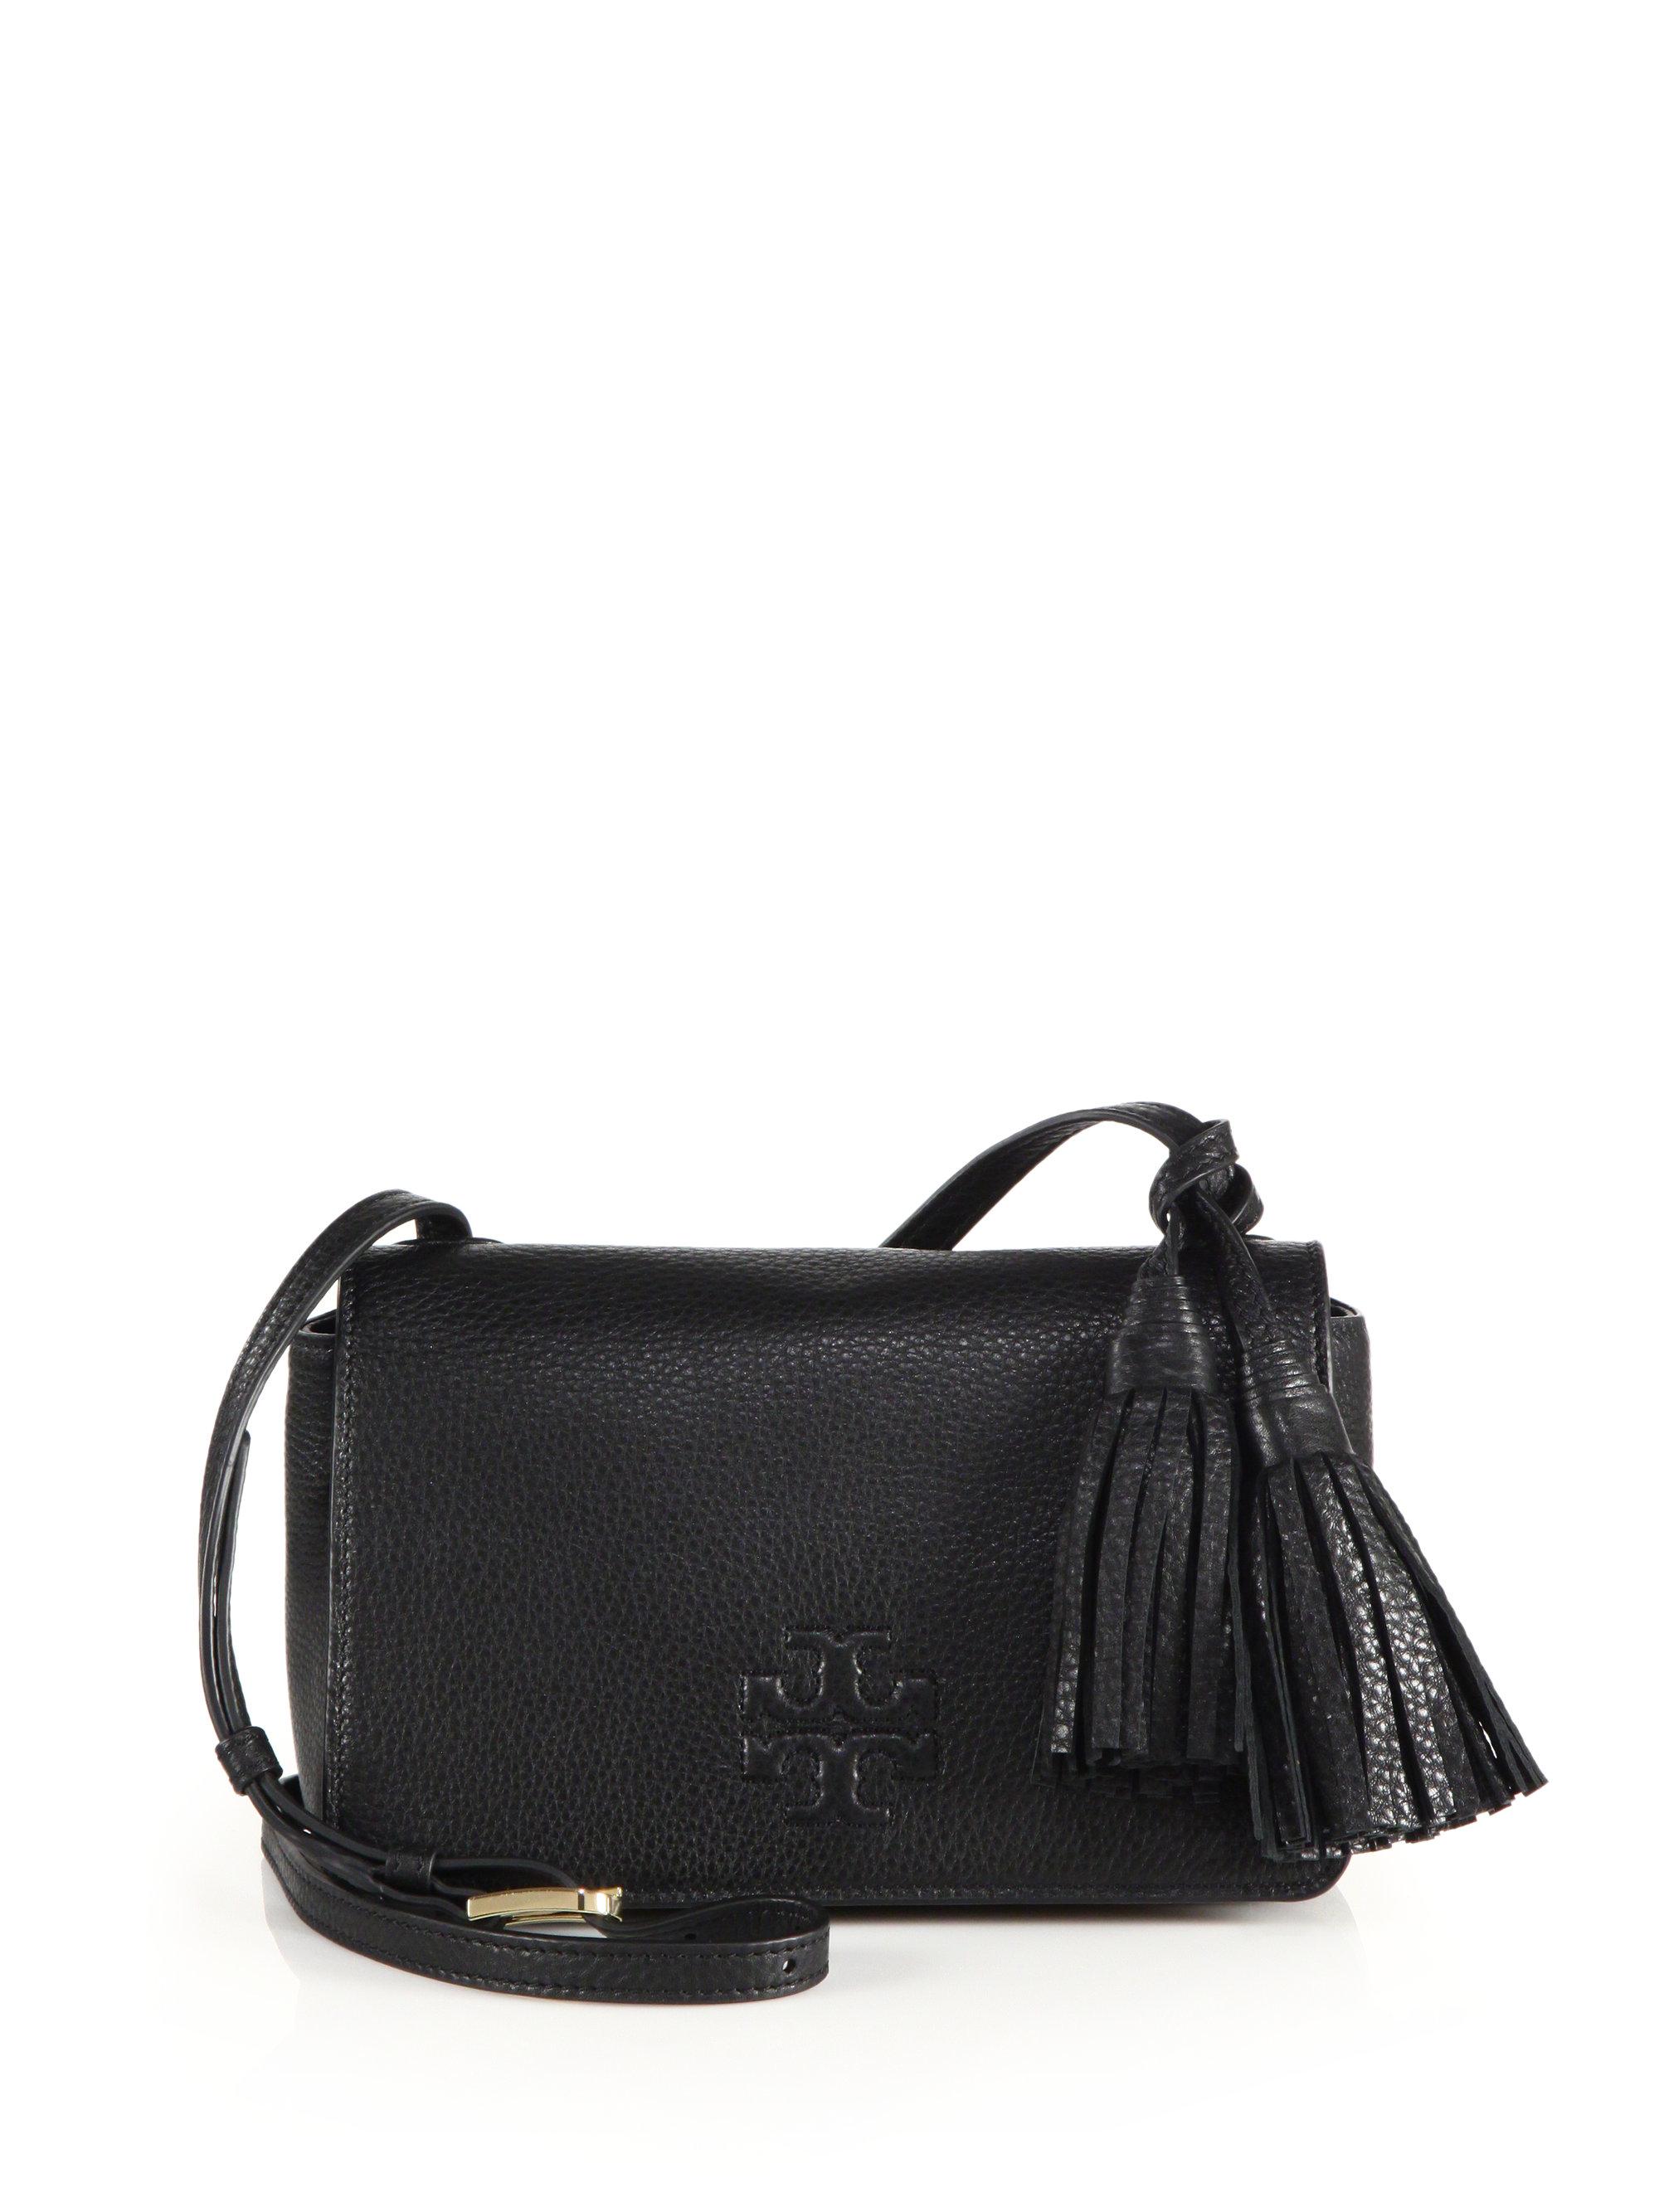 cbeb2d3a93ce Lyst - Tory Burch Thea Mini Leather Tassel Crossbody Bag in Black